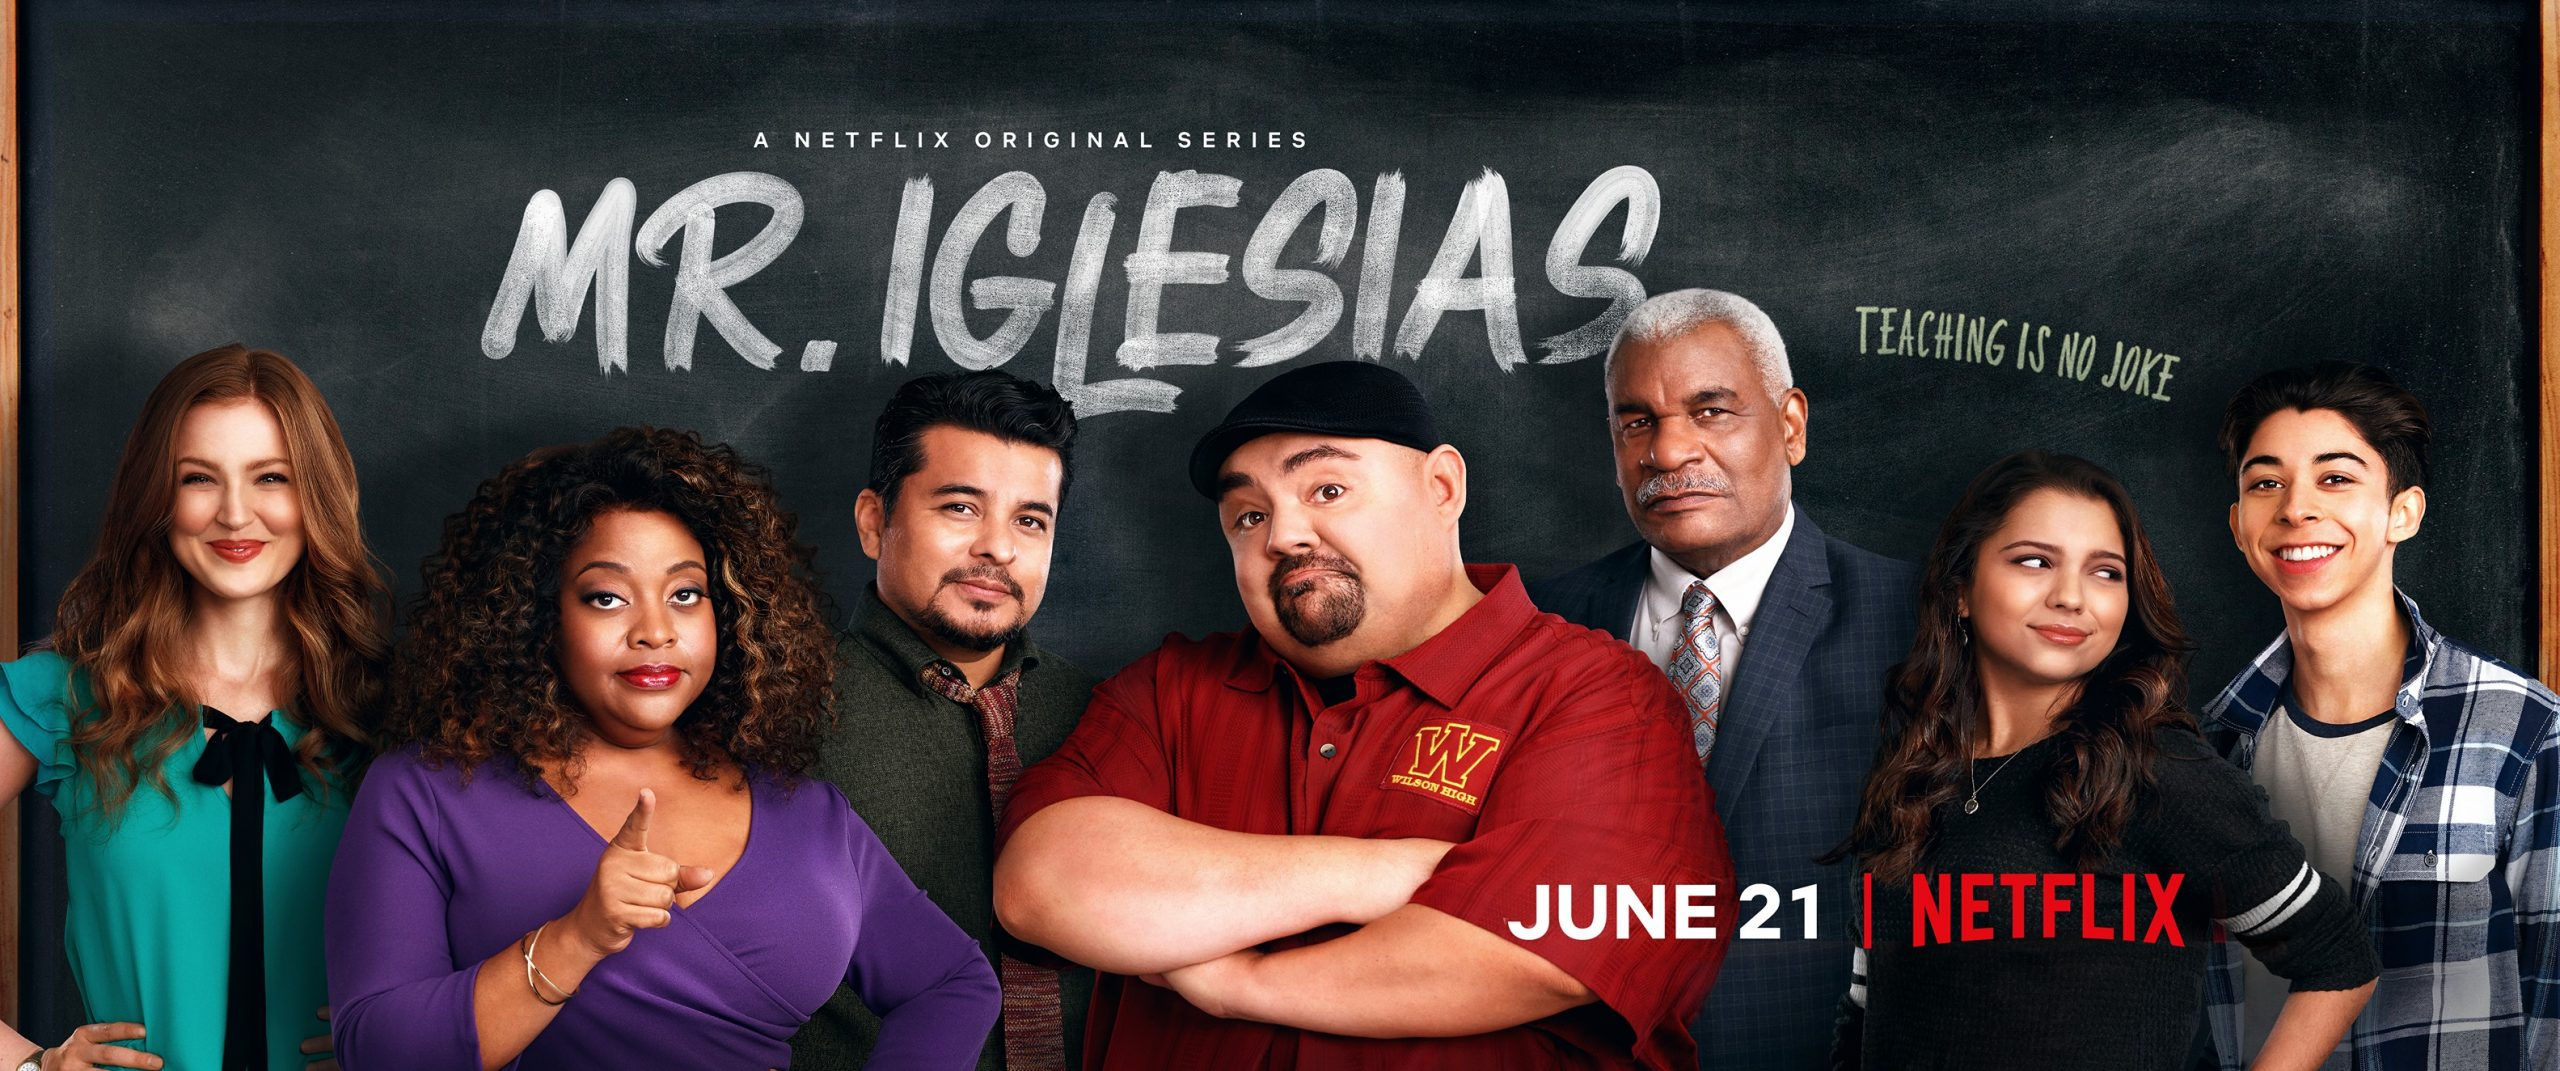 Mr. Iglesias season 4